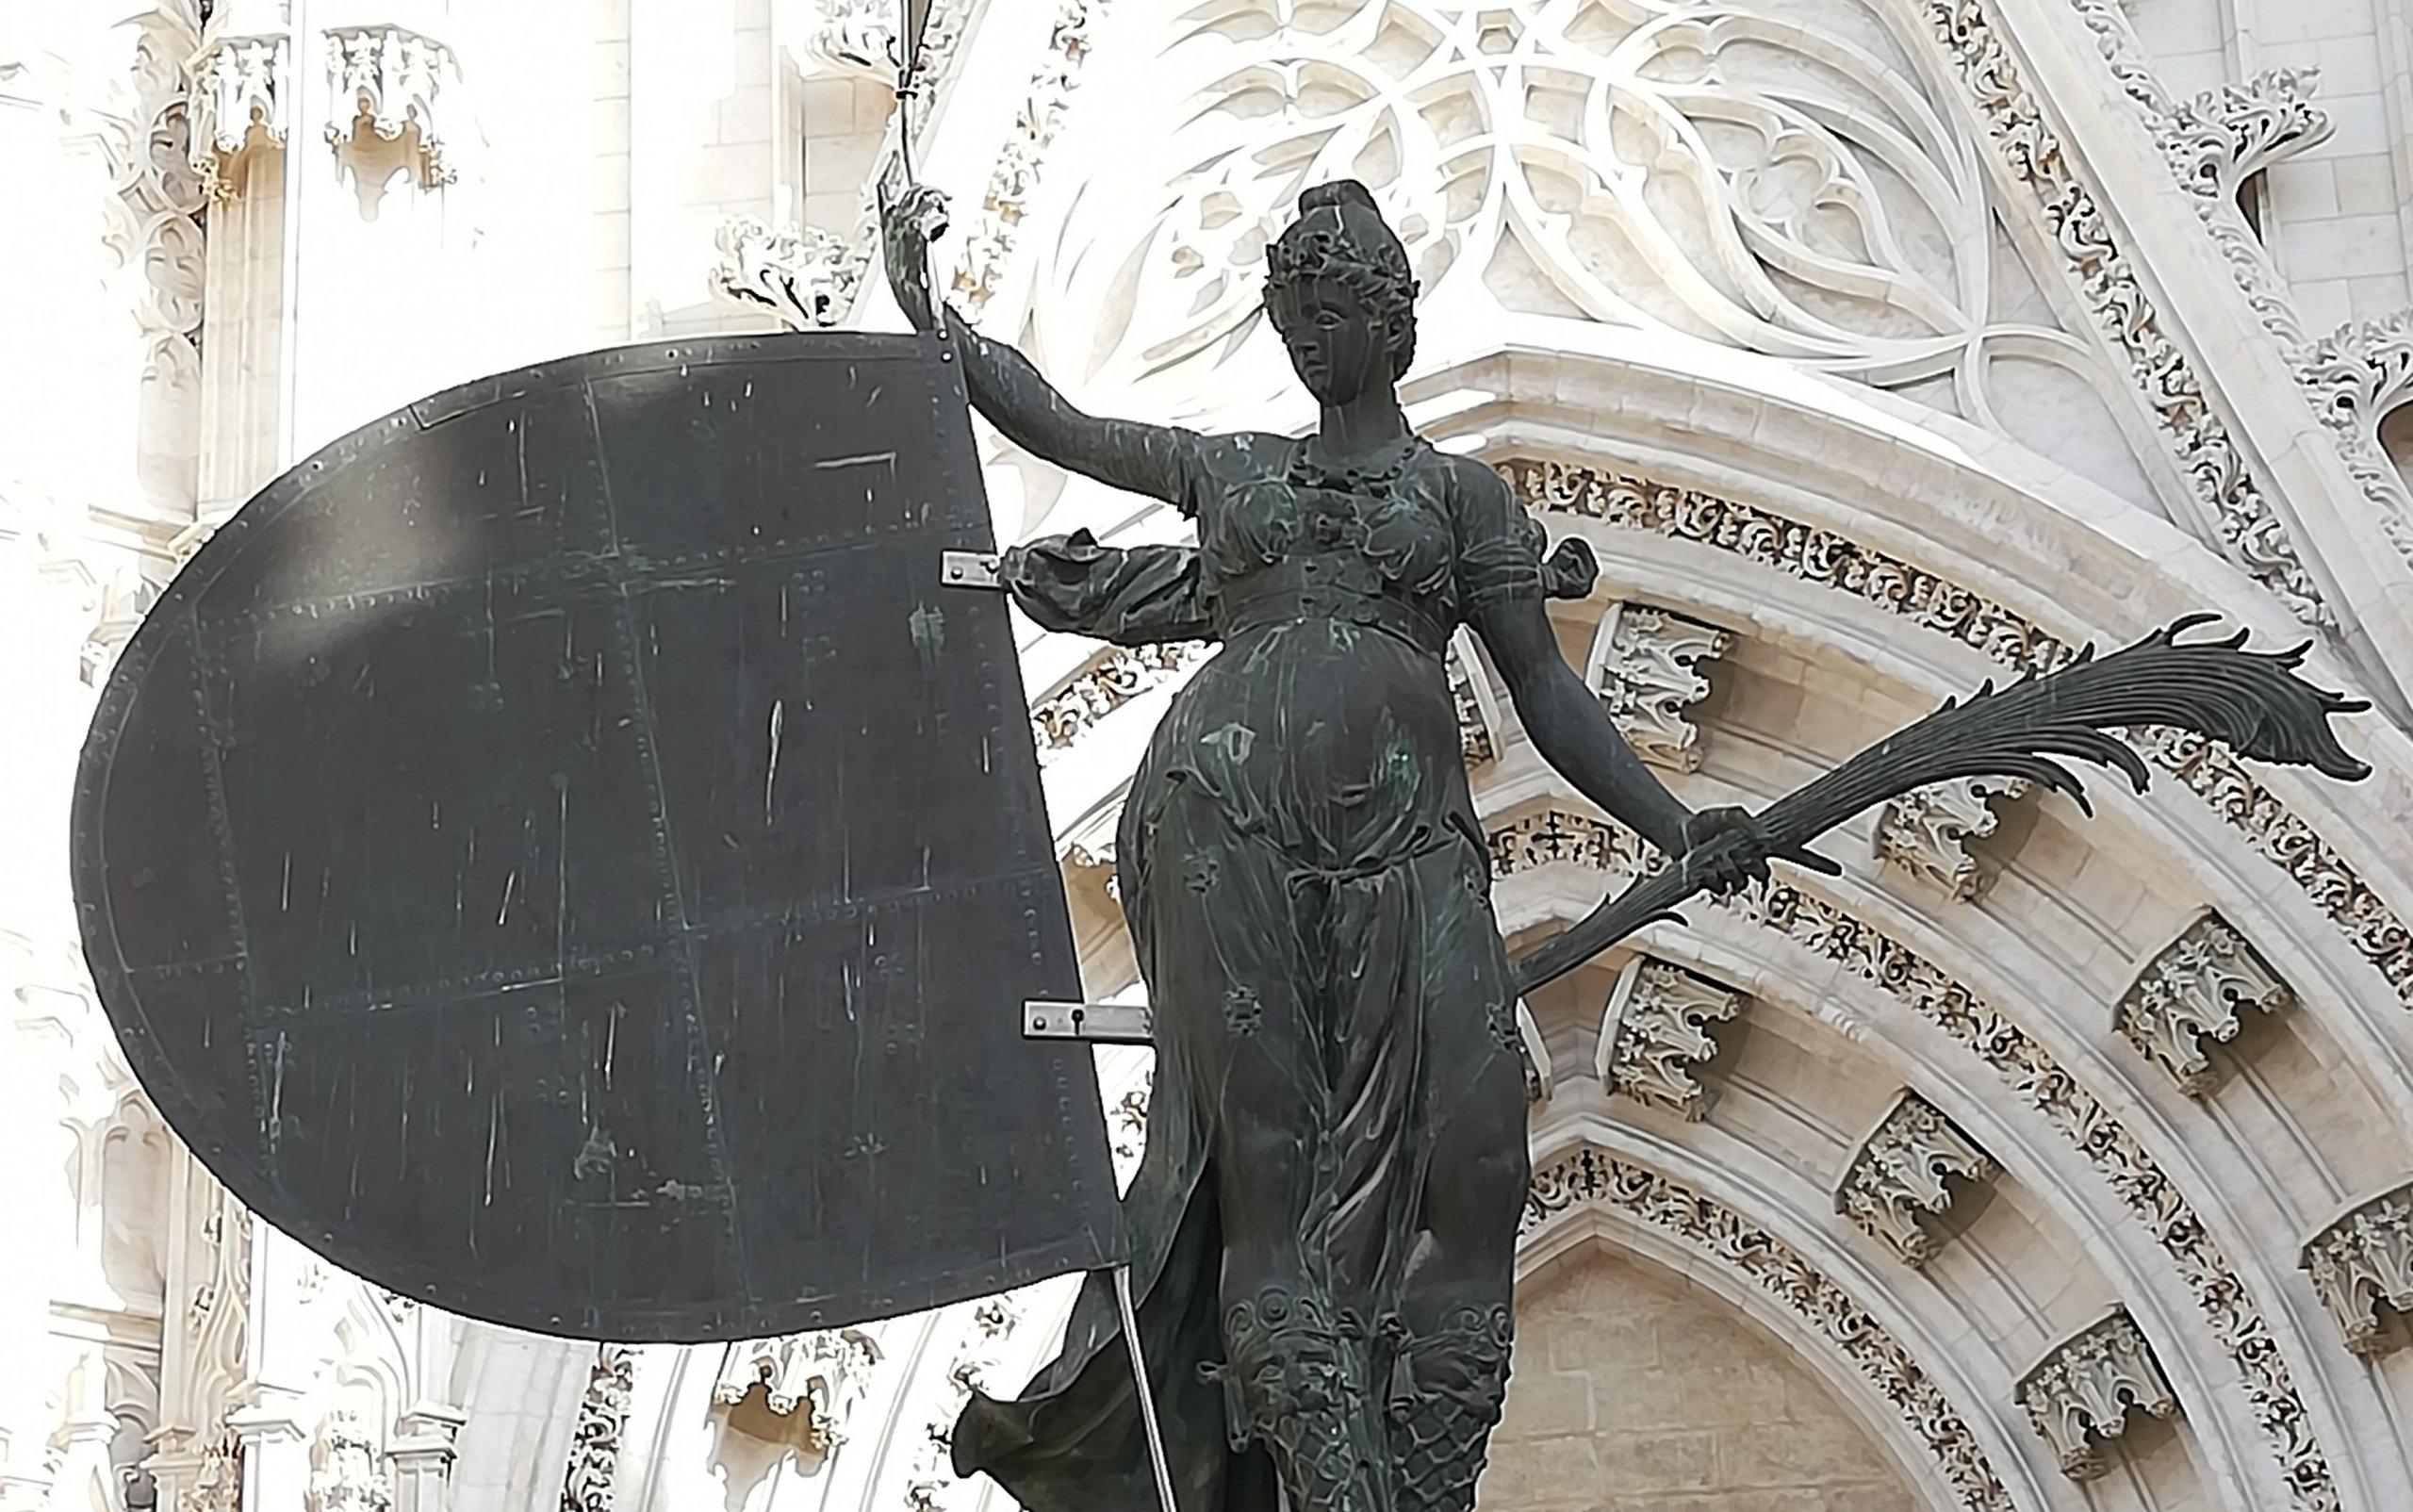 Historia de Sevilla 5. La Sevilla renacentista (siglo XVI)